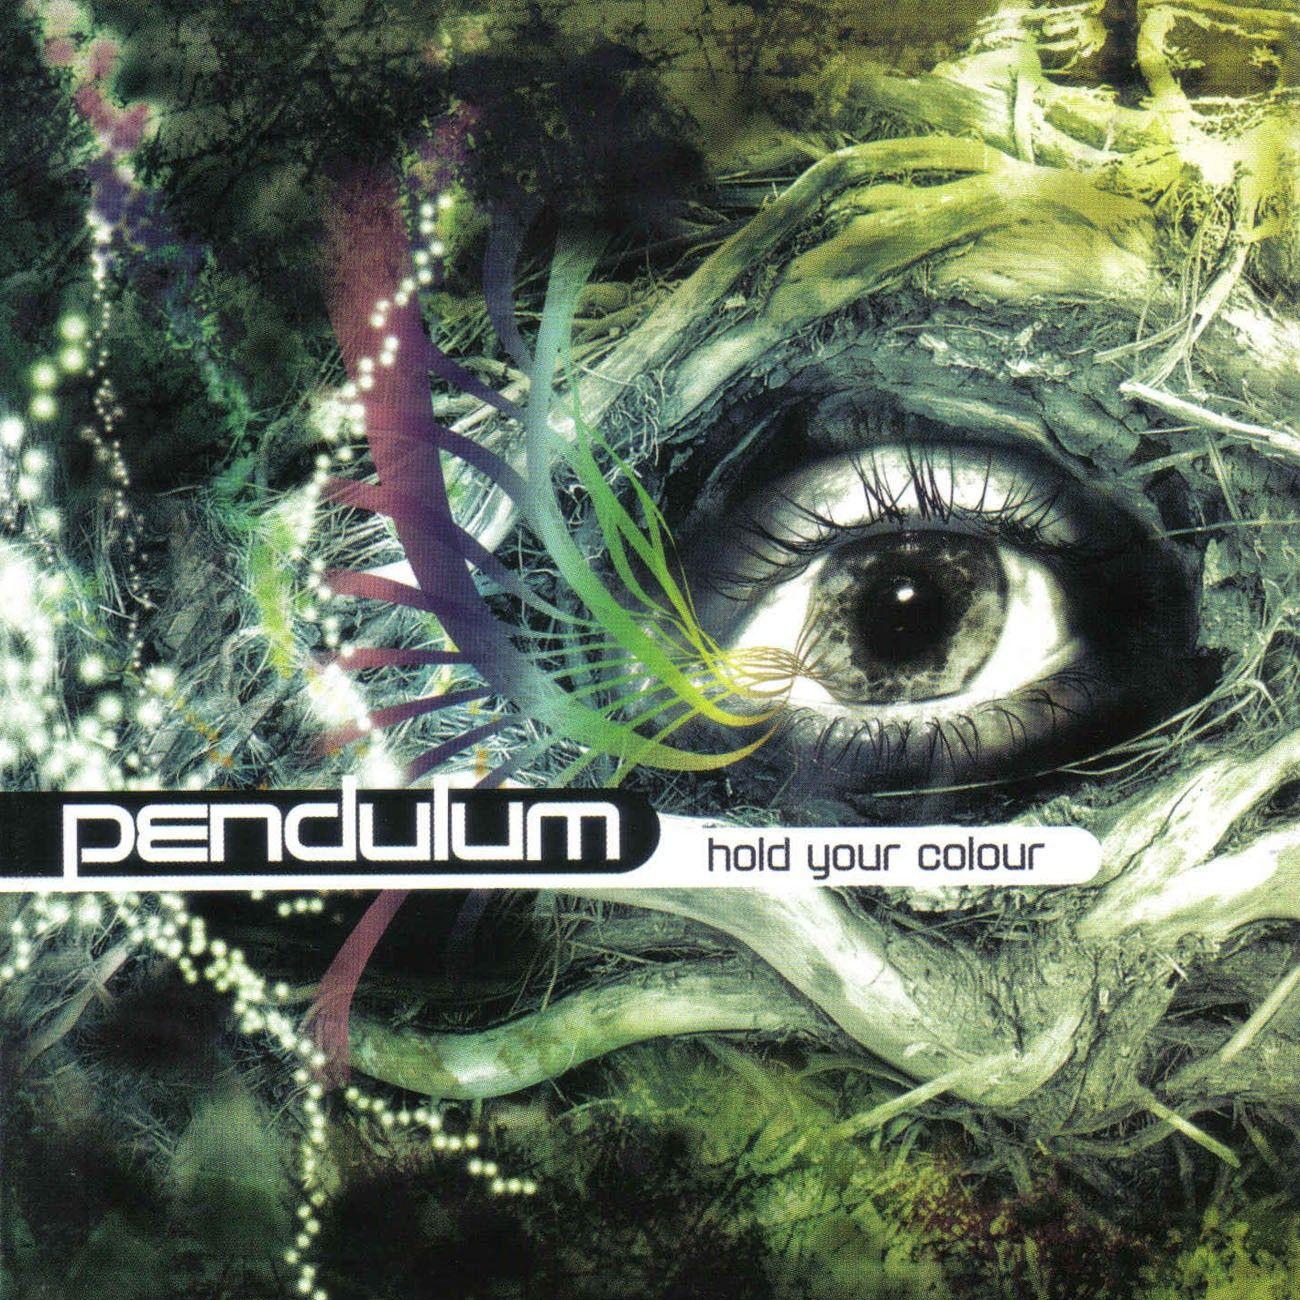 Pendulum/HOLD YOUR COLOUR (2018) 3LP